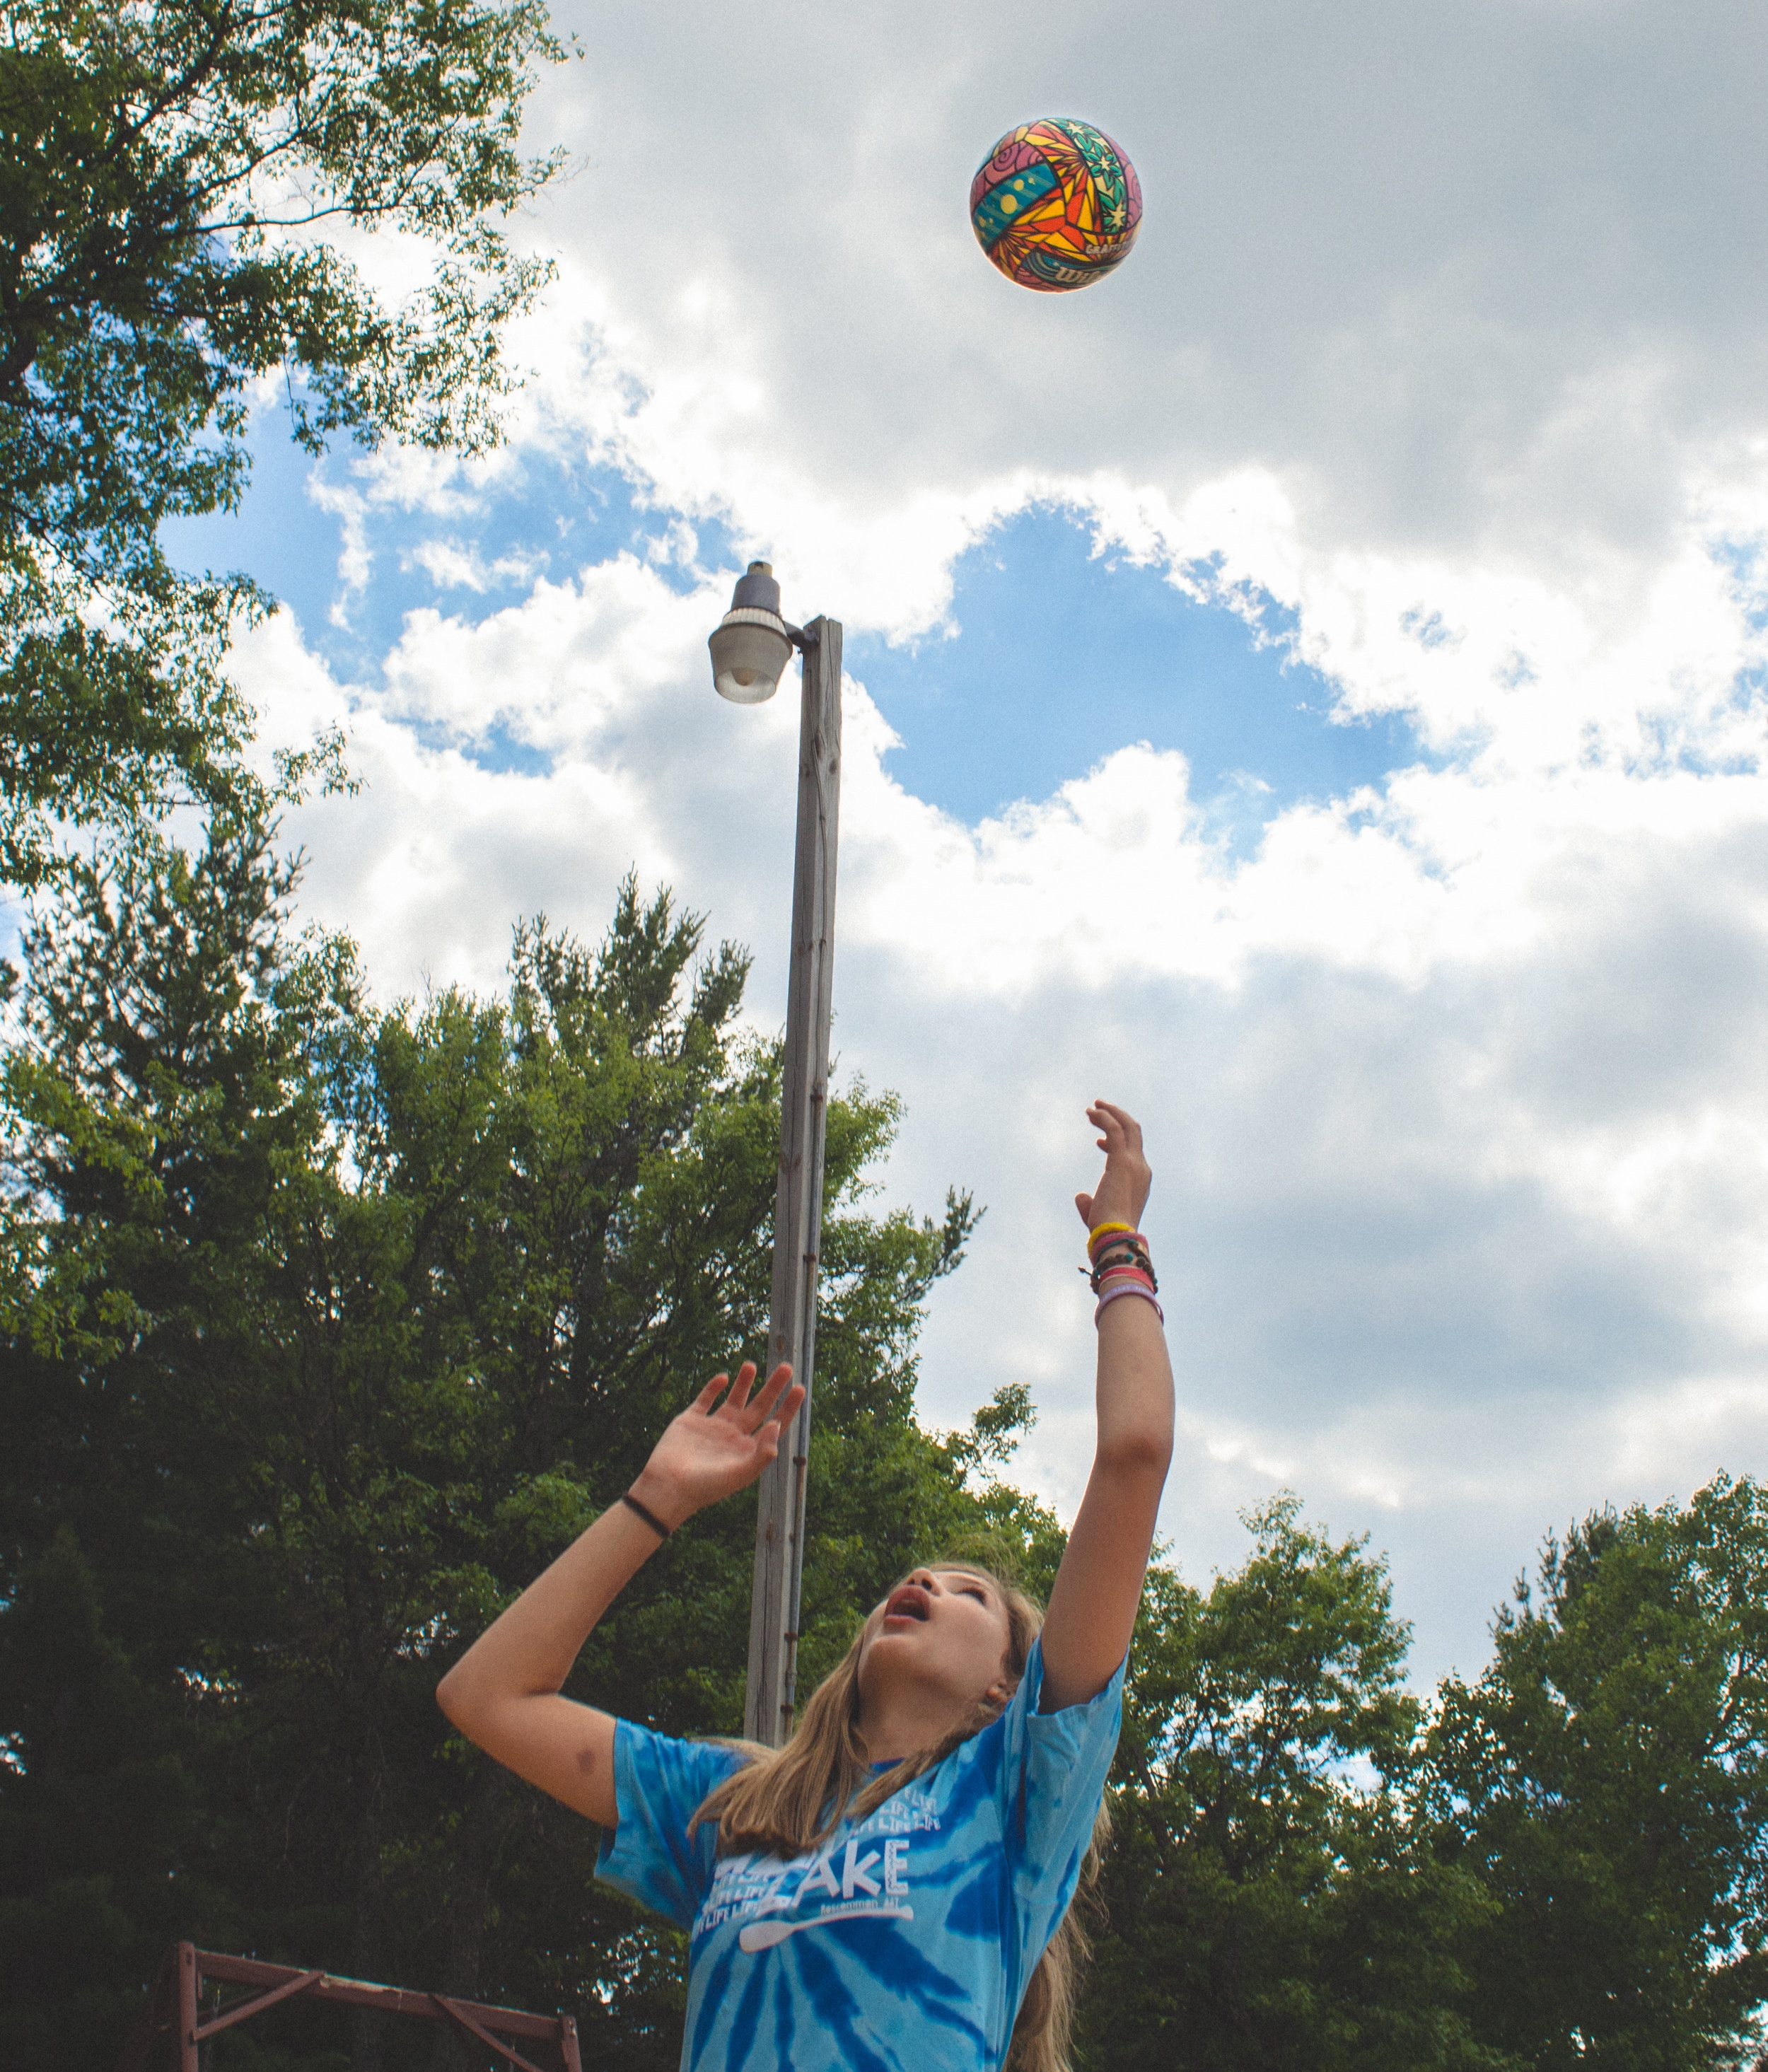 volleyball+%281+of+1%29.jpg